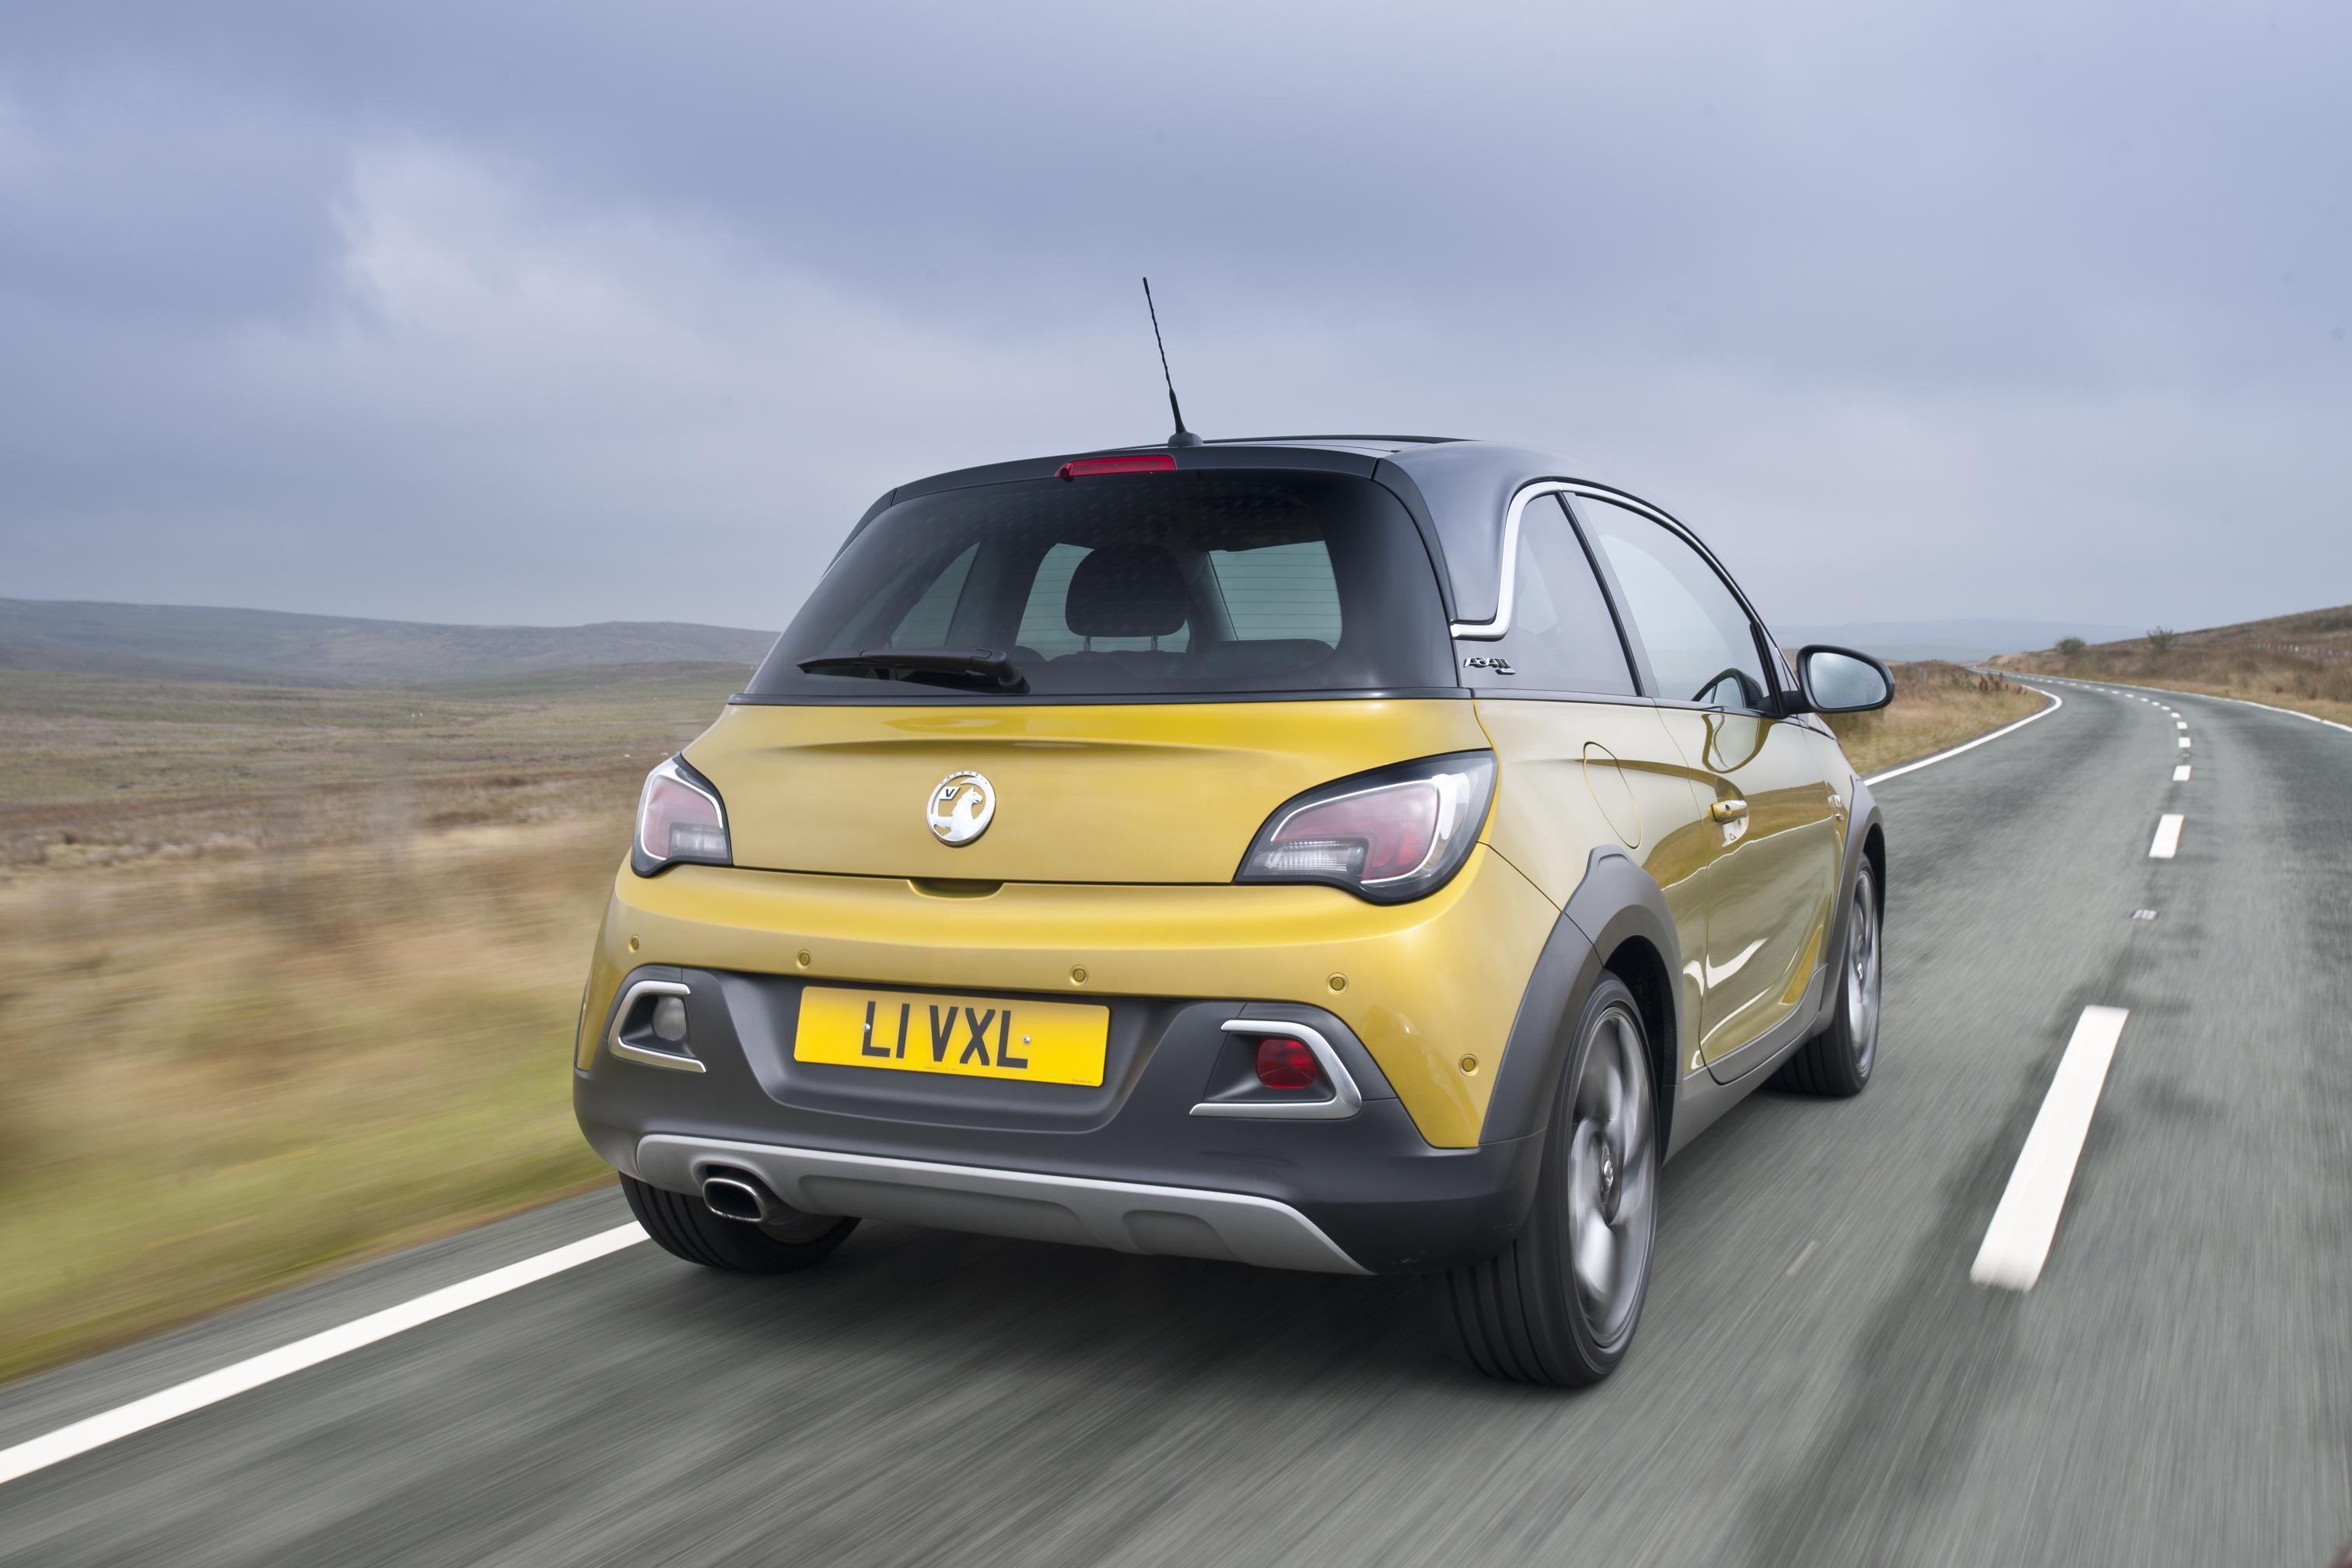 Vauxhall Adam rear view in yellow